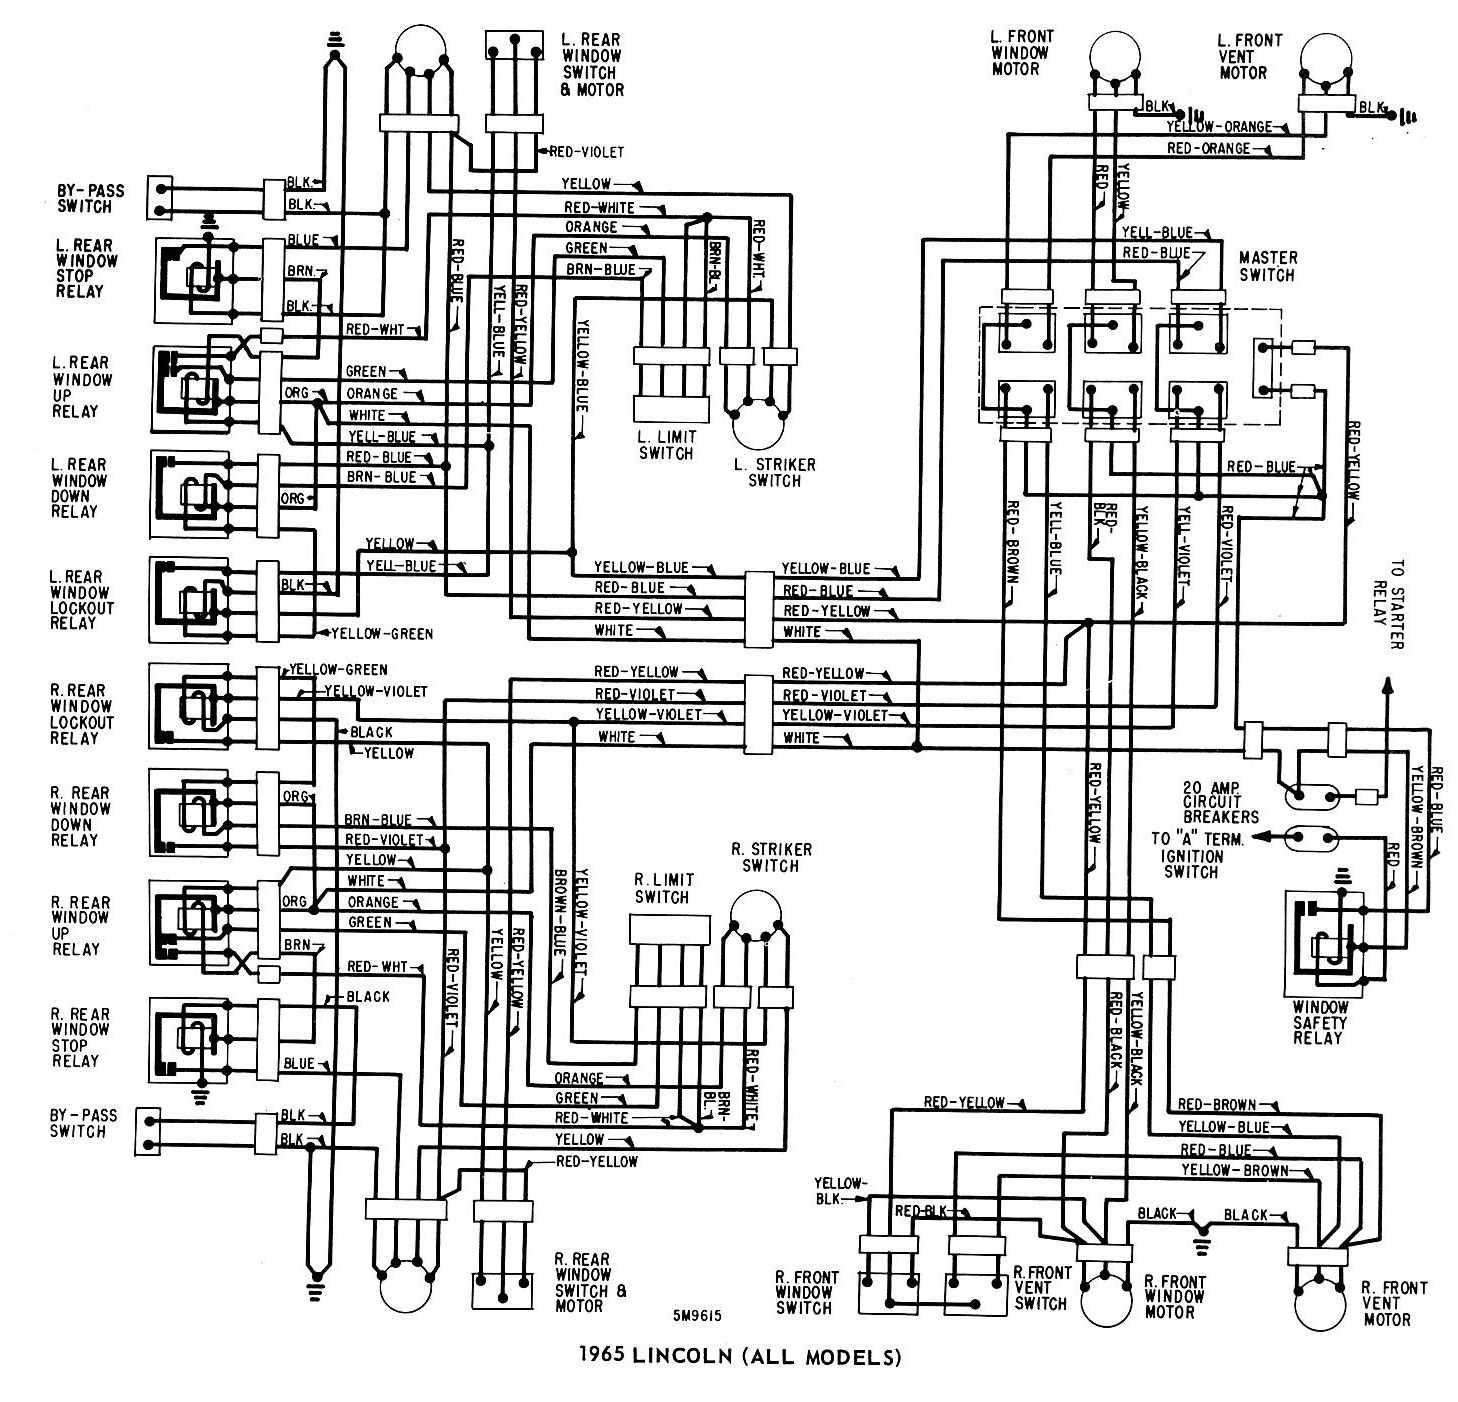 all wiring diagrams bosch alternator diagram holden 2000 cadillac escalade schematic 1989